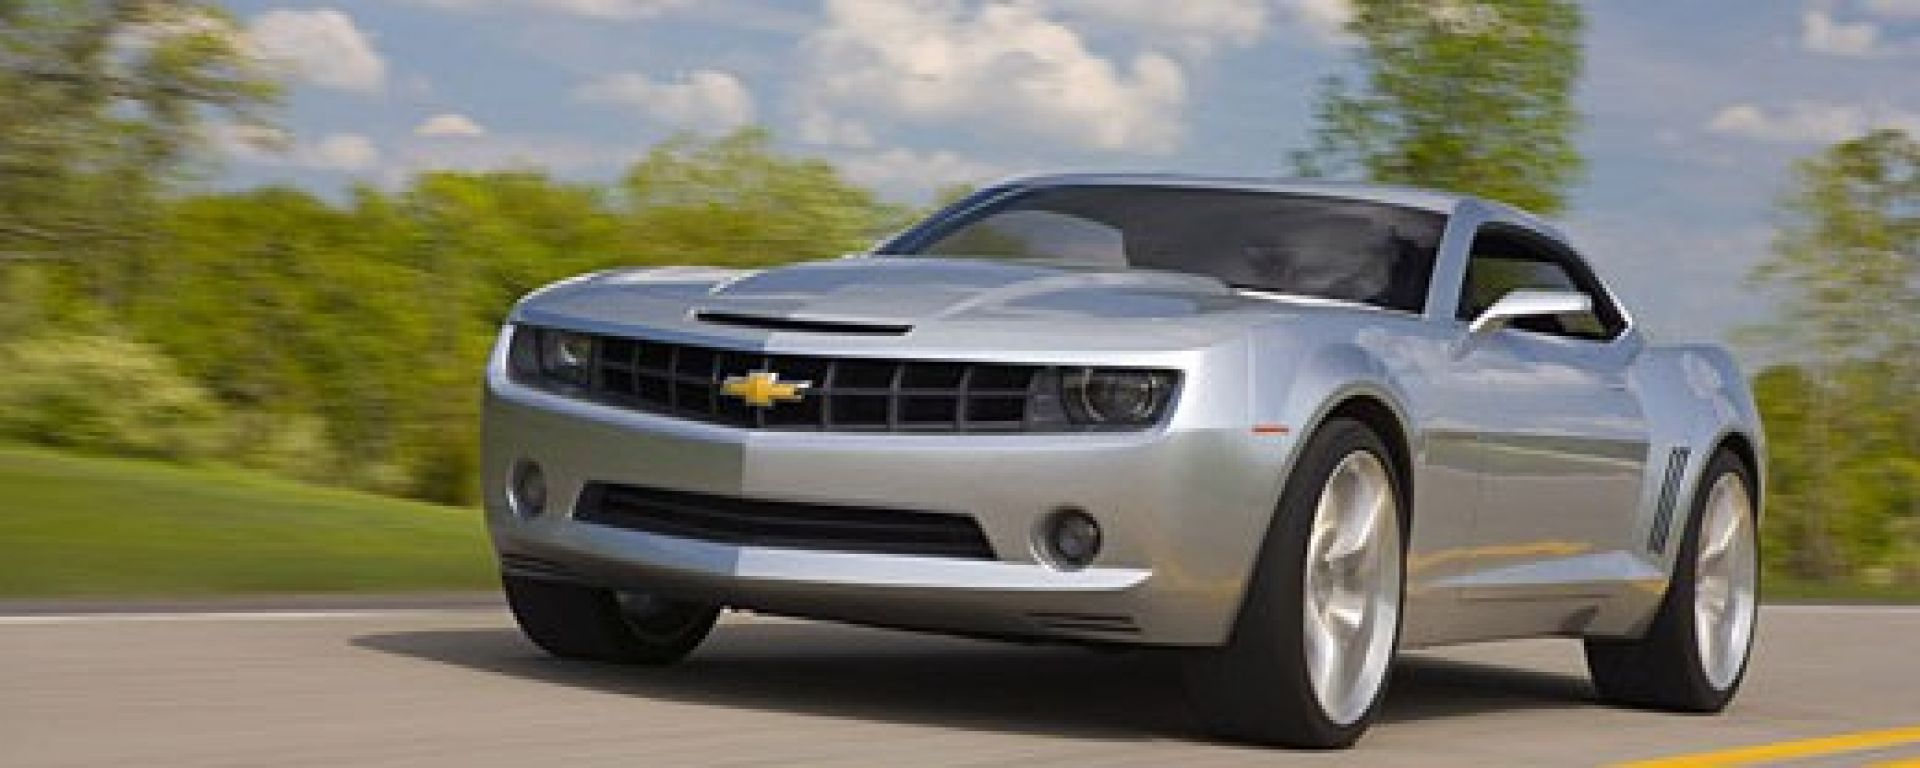 Chevrolet Camaro: arriva nel 2009